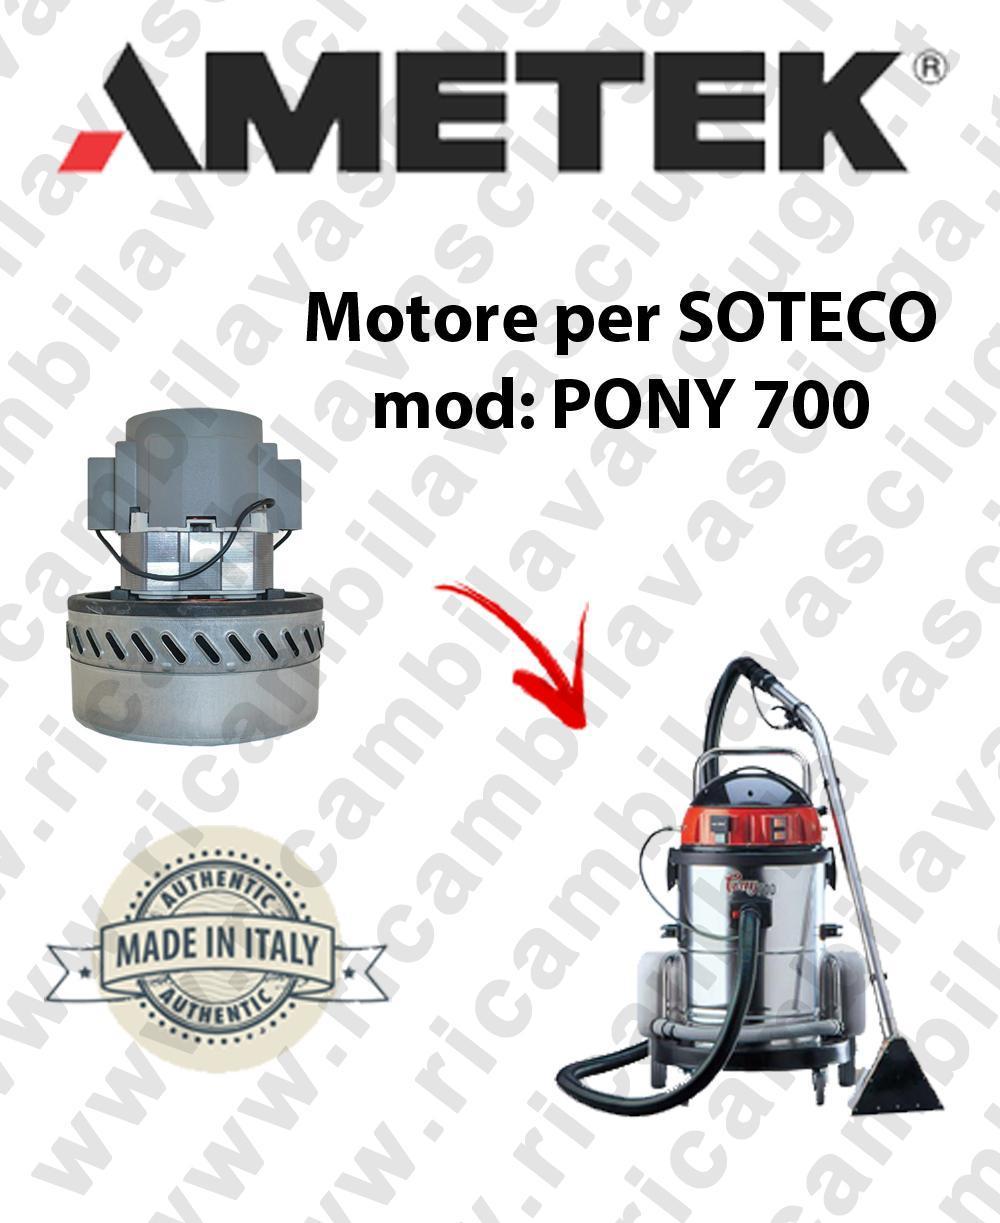 PONY 700 Saugmotor AMETEK für Staubsauger SOTECO